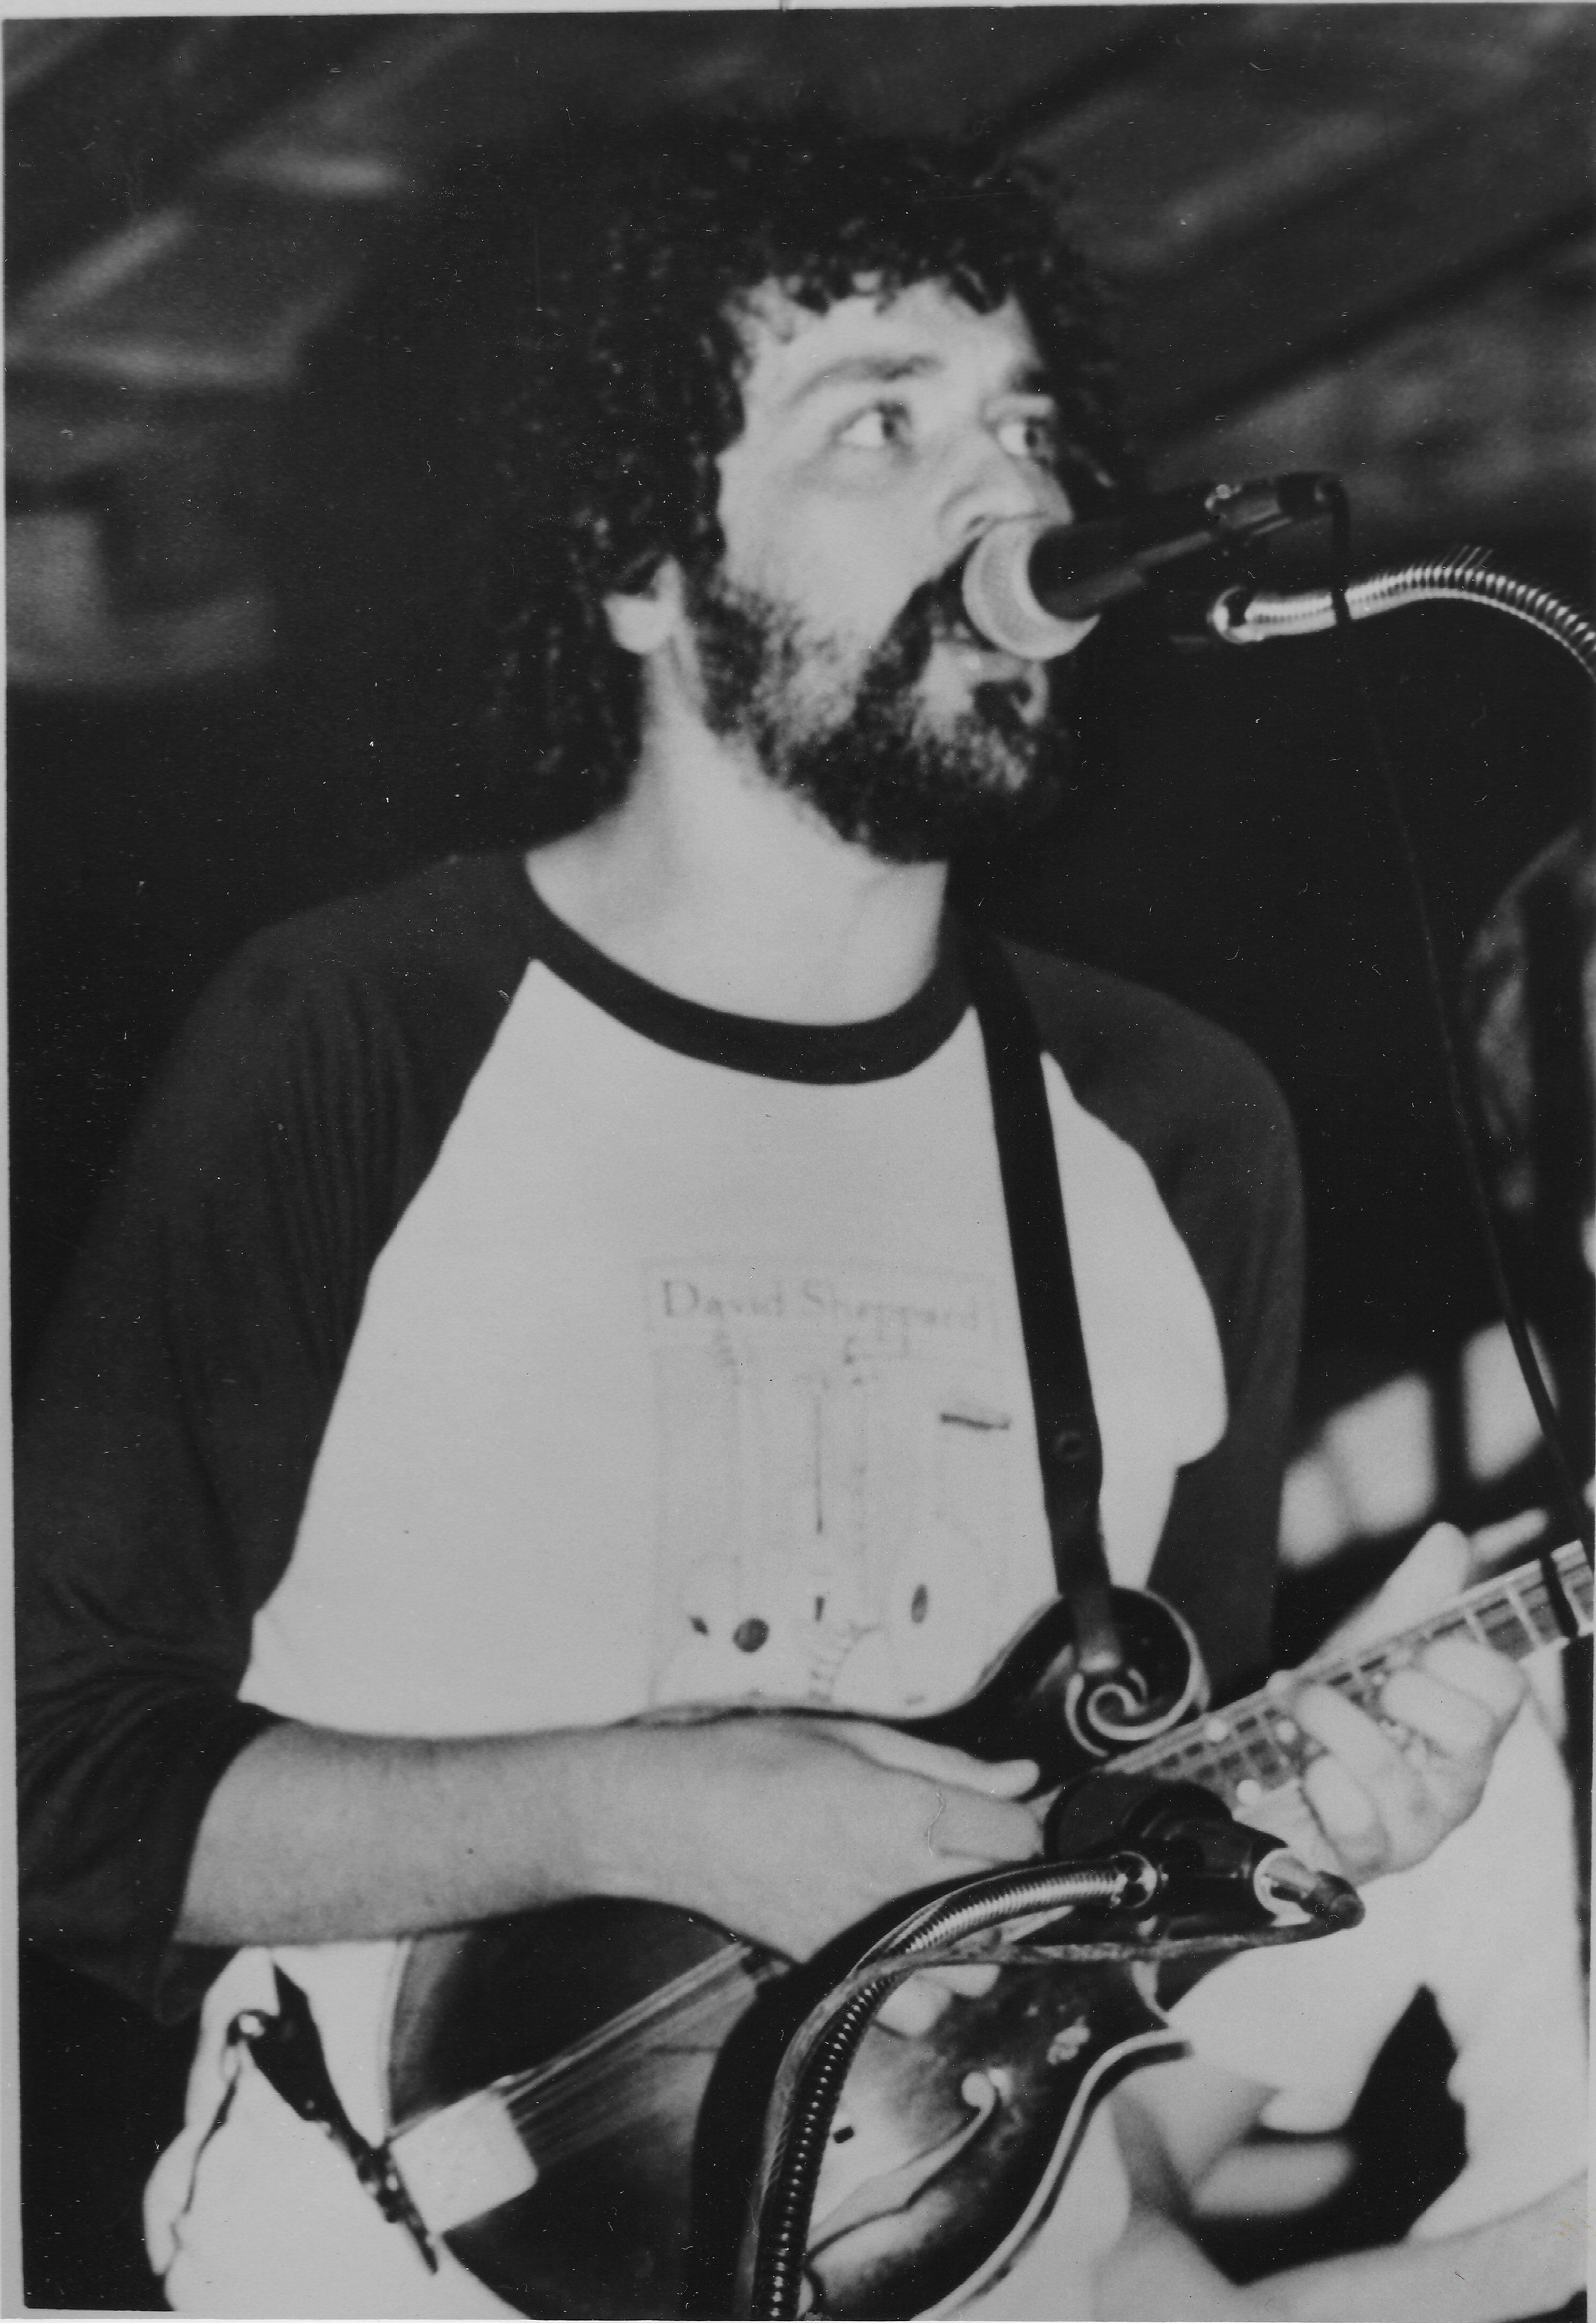 Tony Williamson and his Mandolin in 1981.